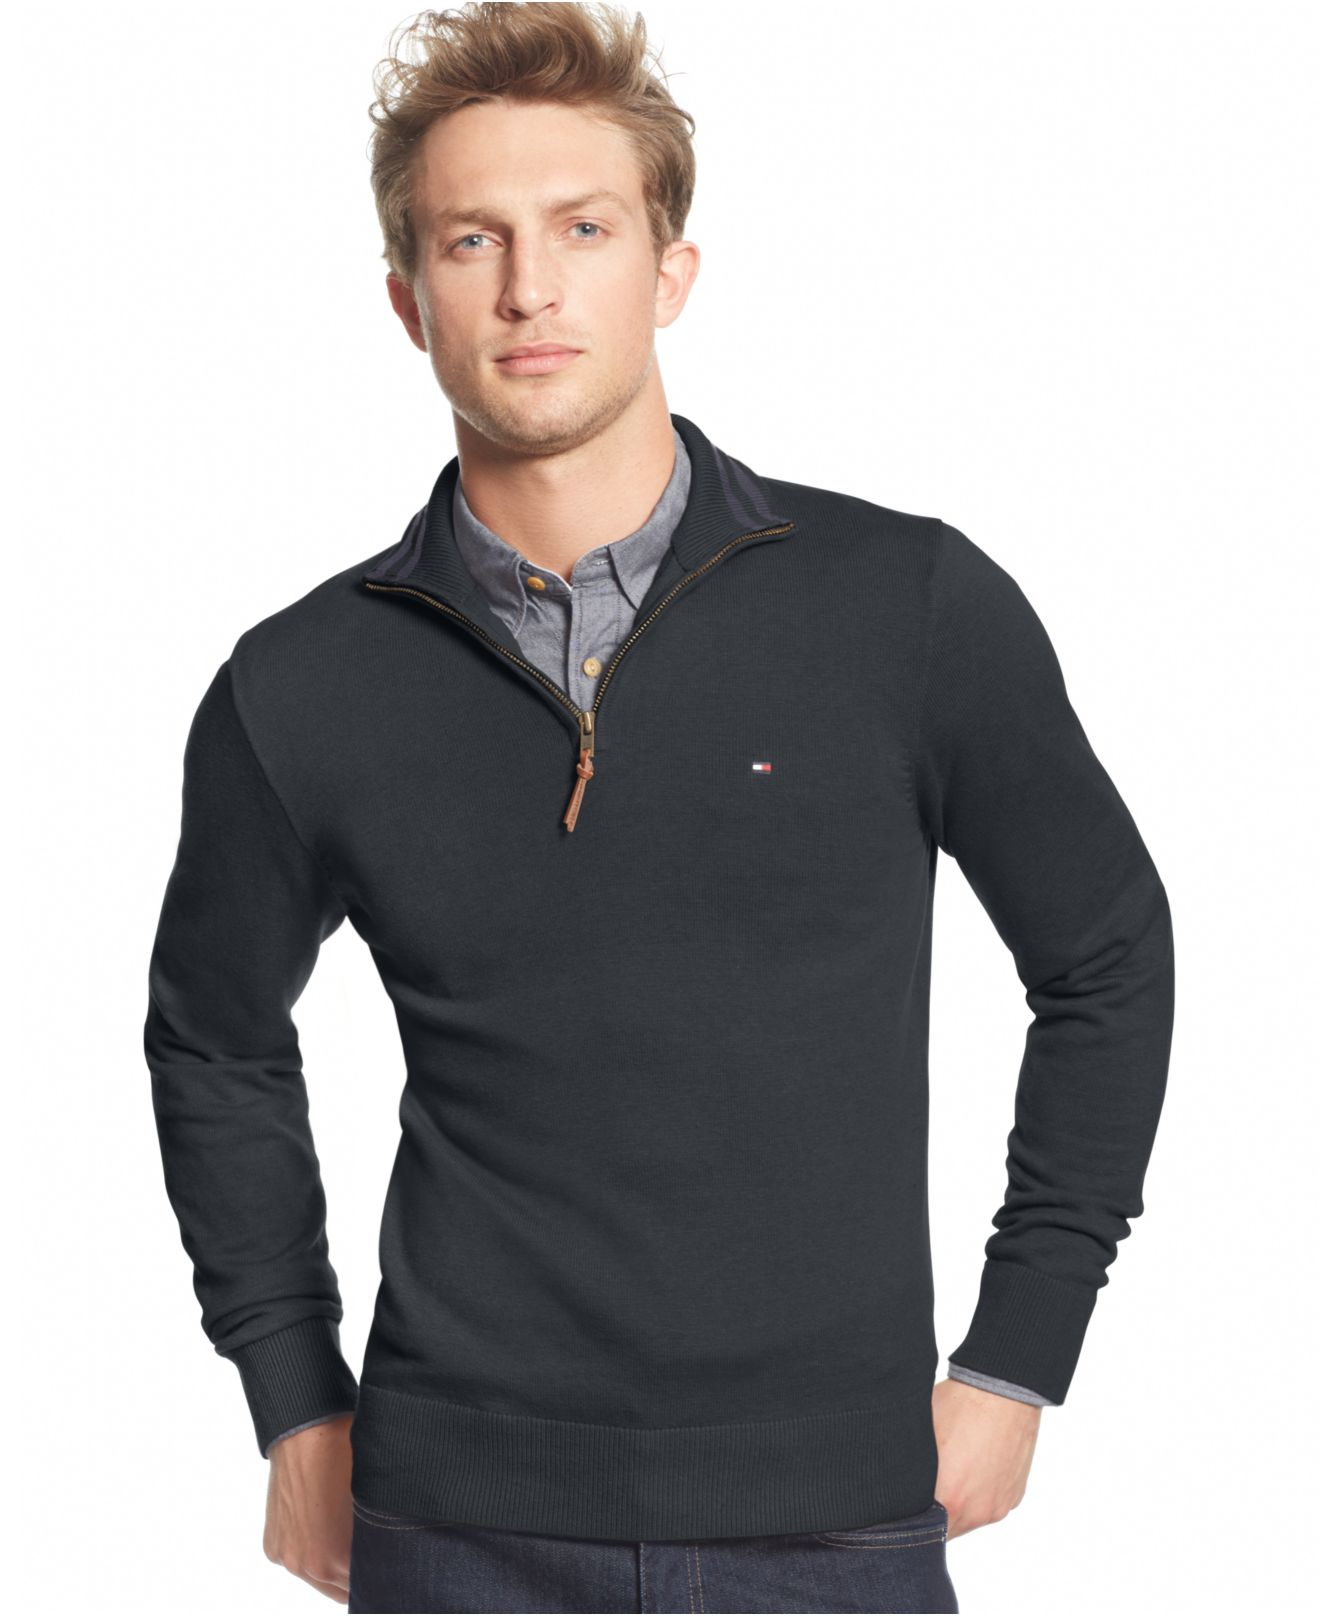 tommy hilfiger signature solid quarter zip sweater in gray. Black Bedroom Furniture Sets. Home Design Ideas